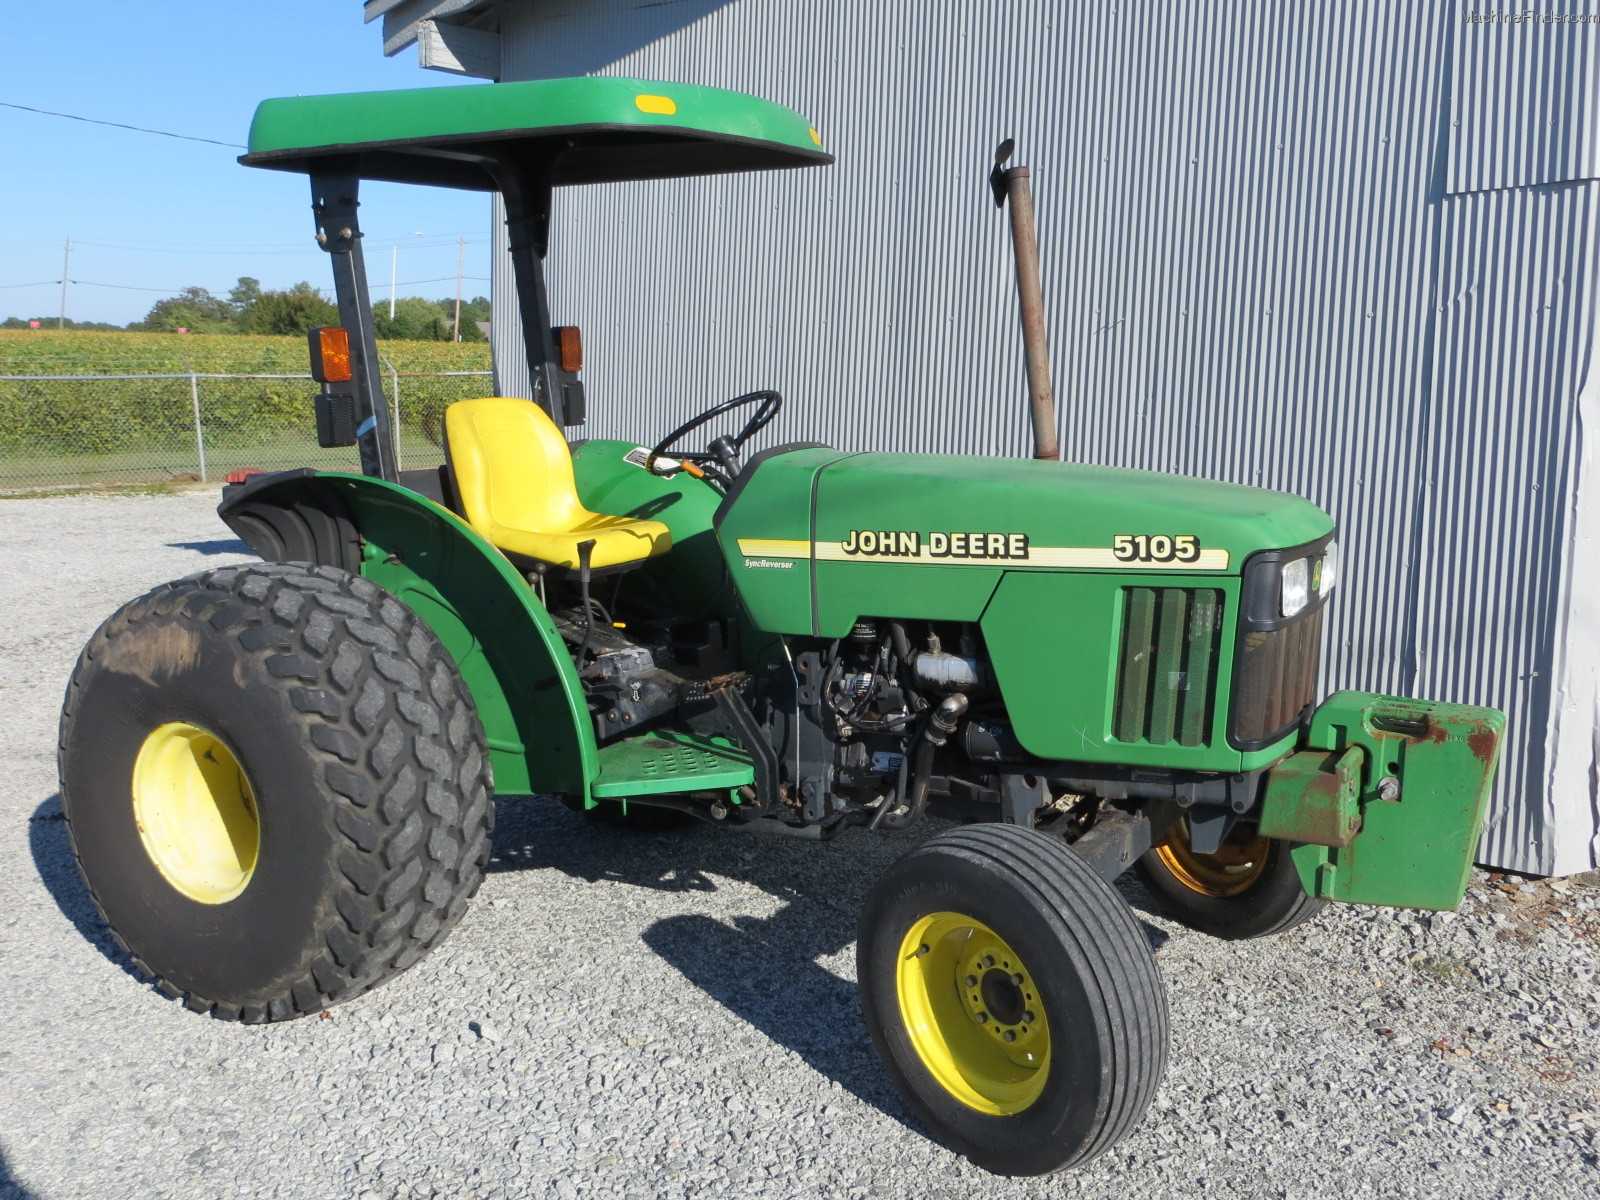 1998 John Deere 5105 Tractors - Utility (40-100hp) - John ...